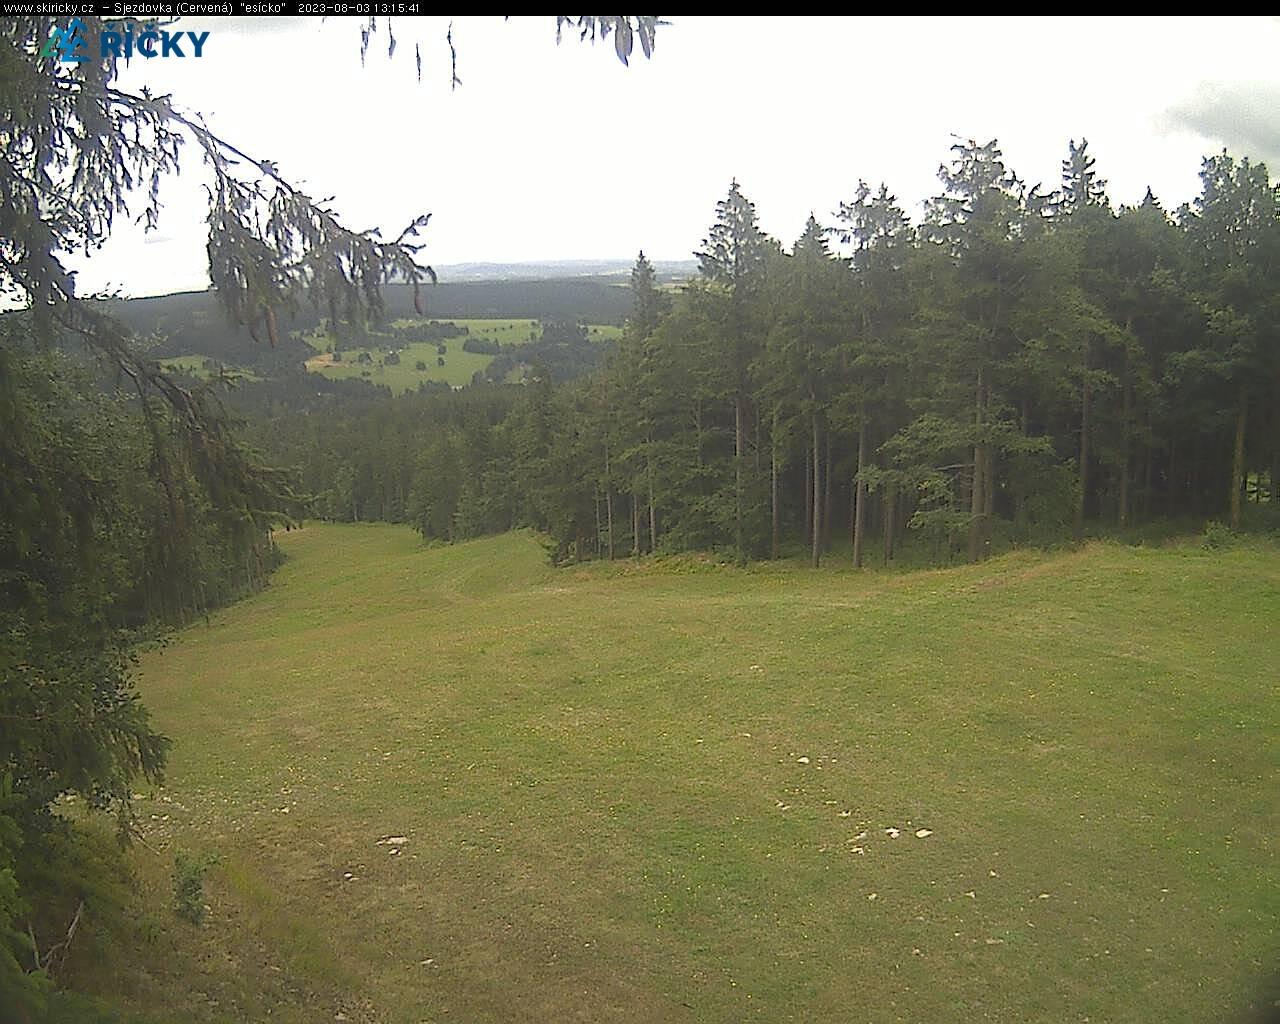 Webcam Skigebiet Ricky v O.h. cam 4 - Adlergebirge